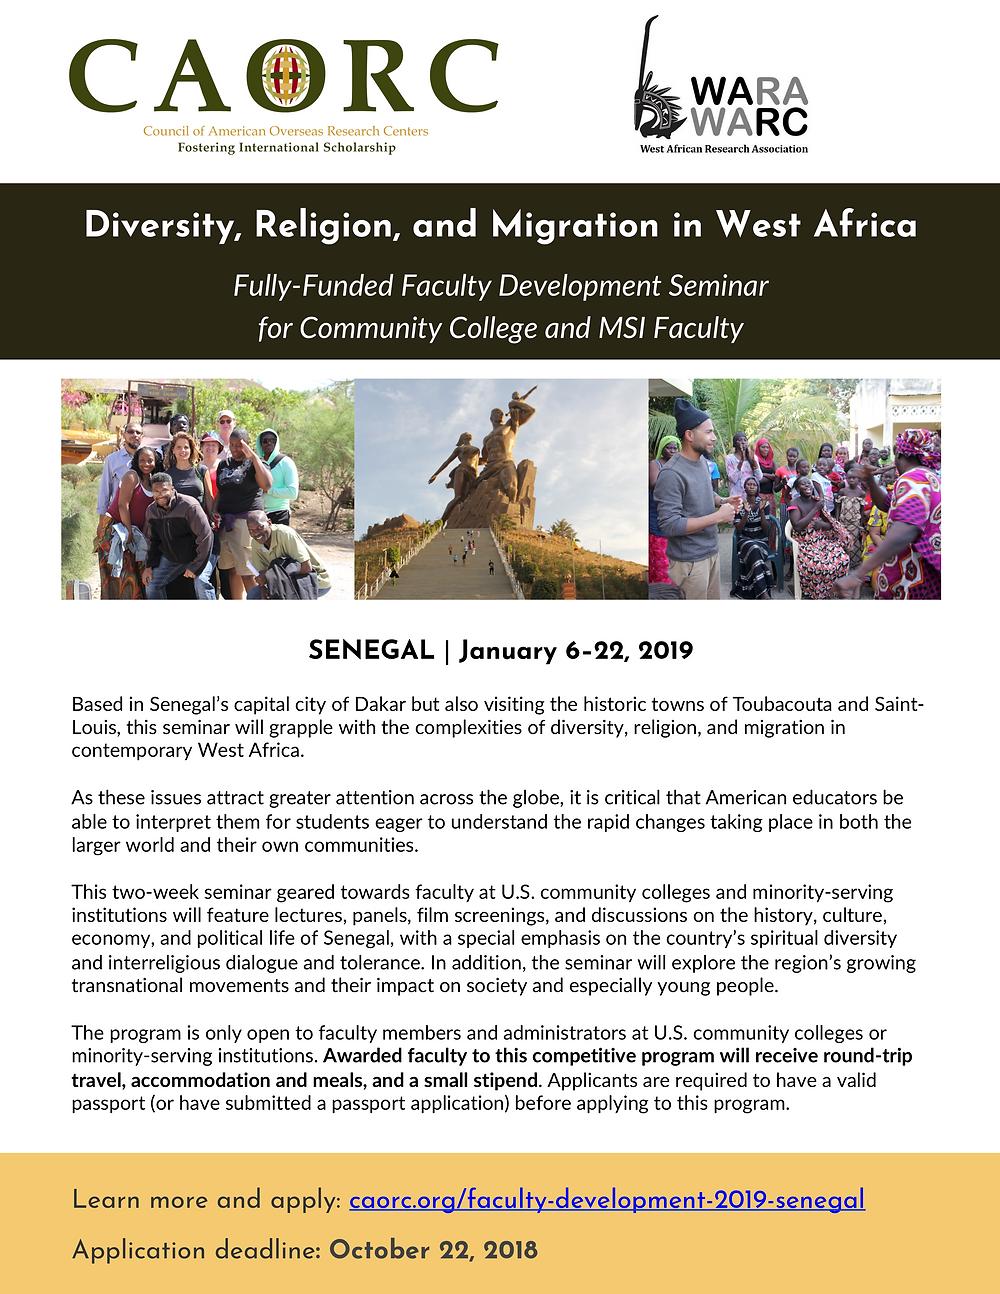 CAORC-WARC Senegal faculty development seminar announcement flyer